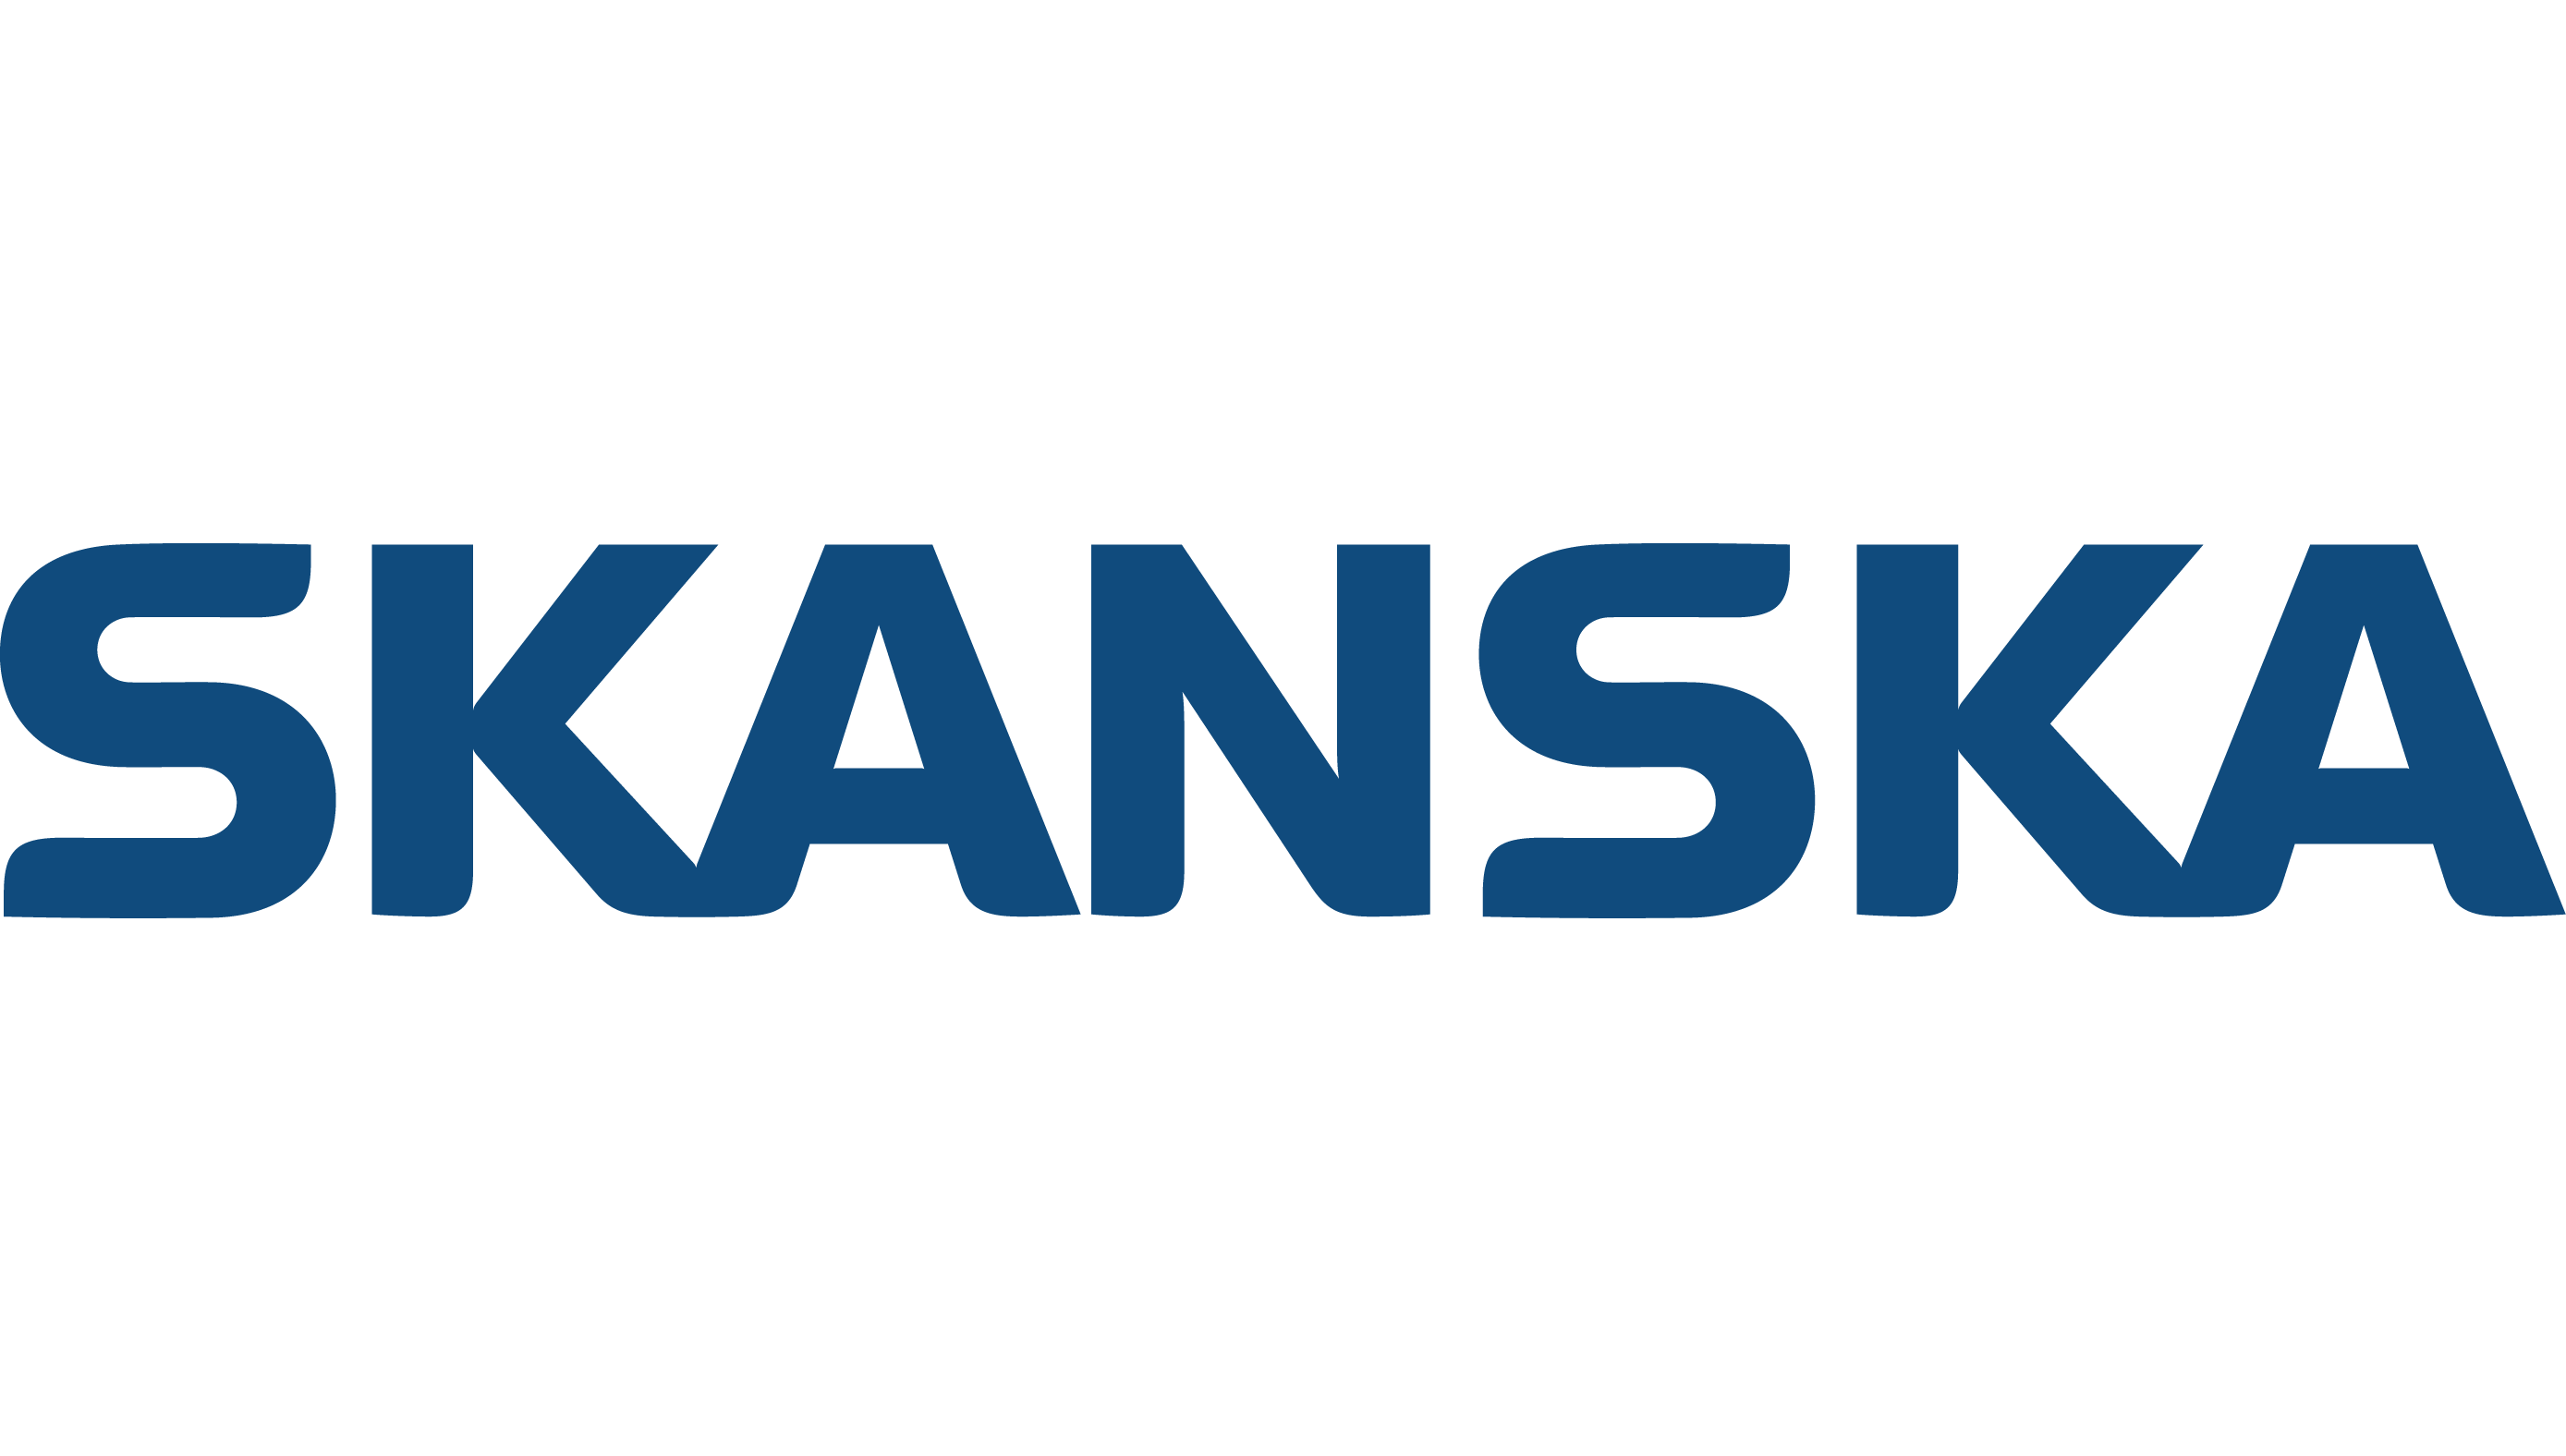 SKANSKA-orig-logoCMYK(1)